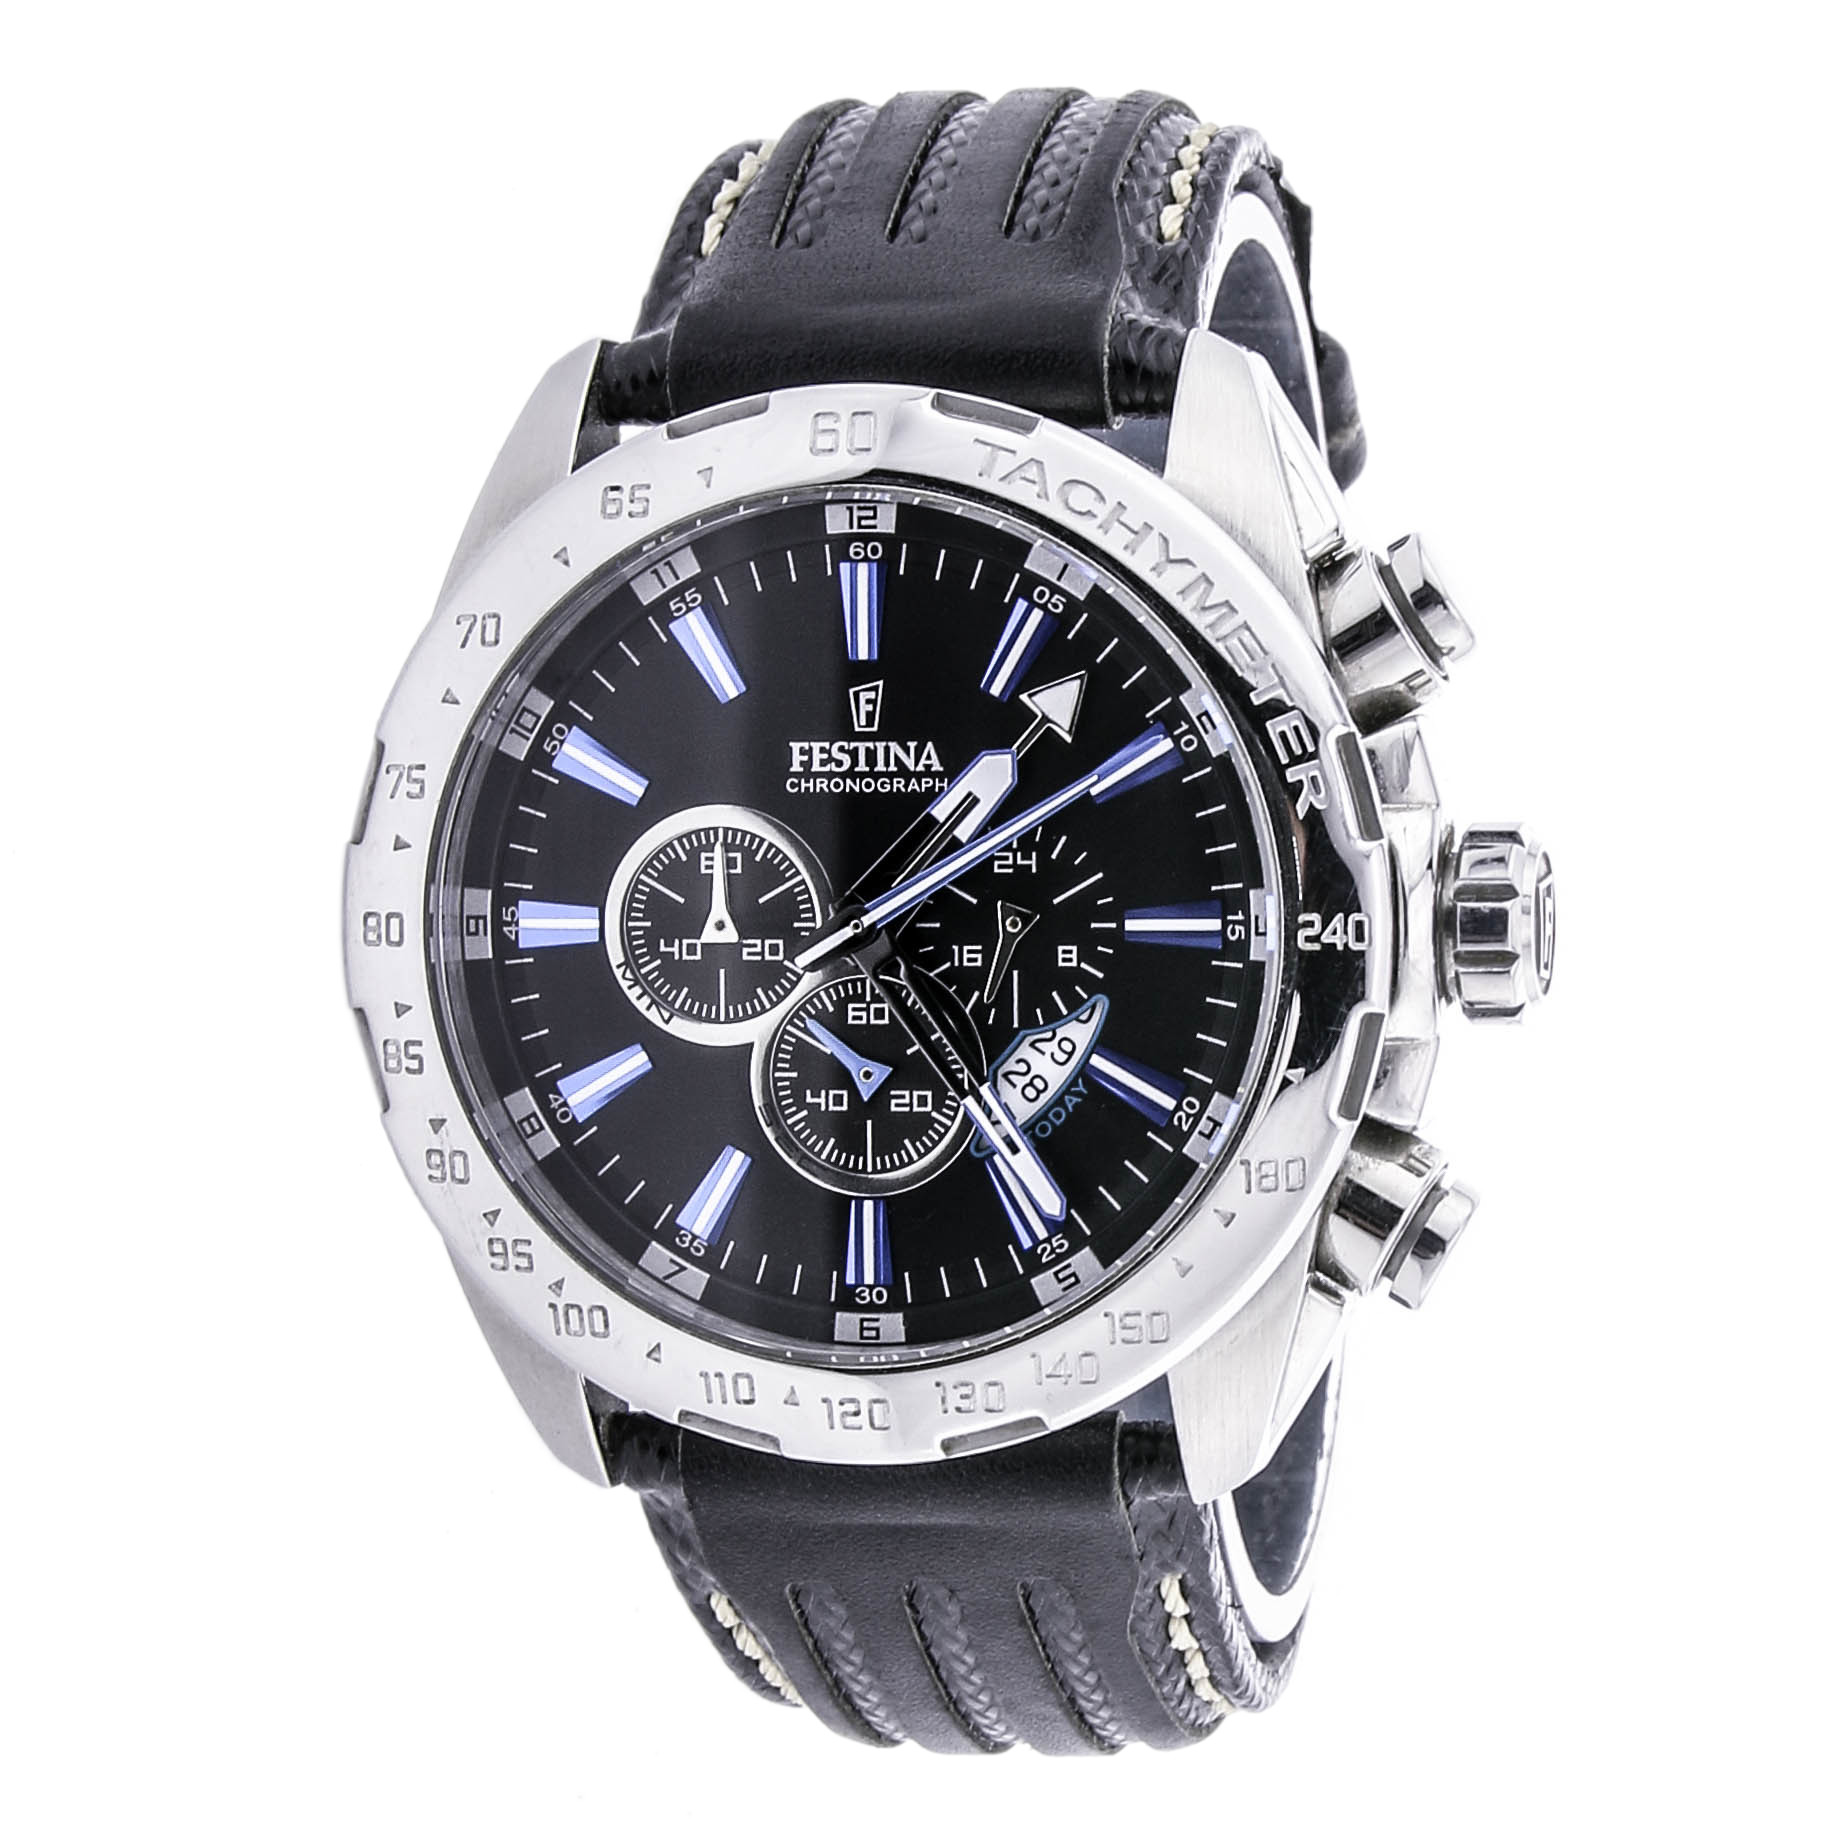 Zegarek FESTINA F16489/3 chronograf datownik